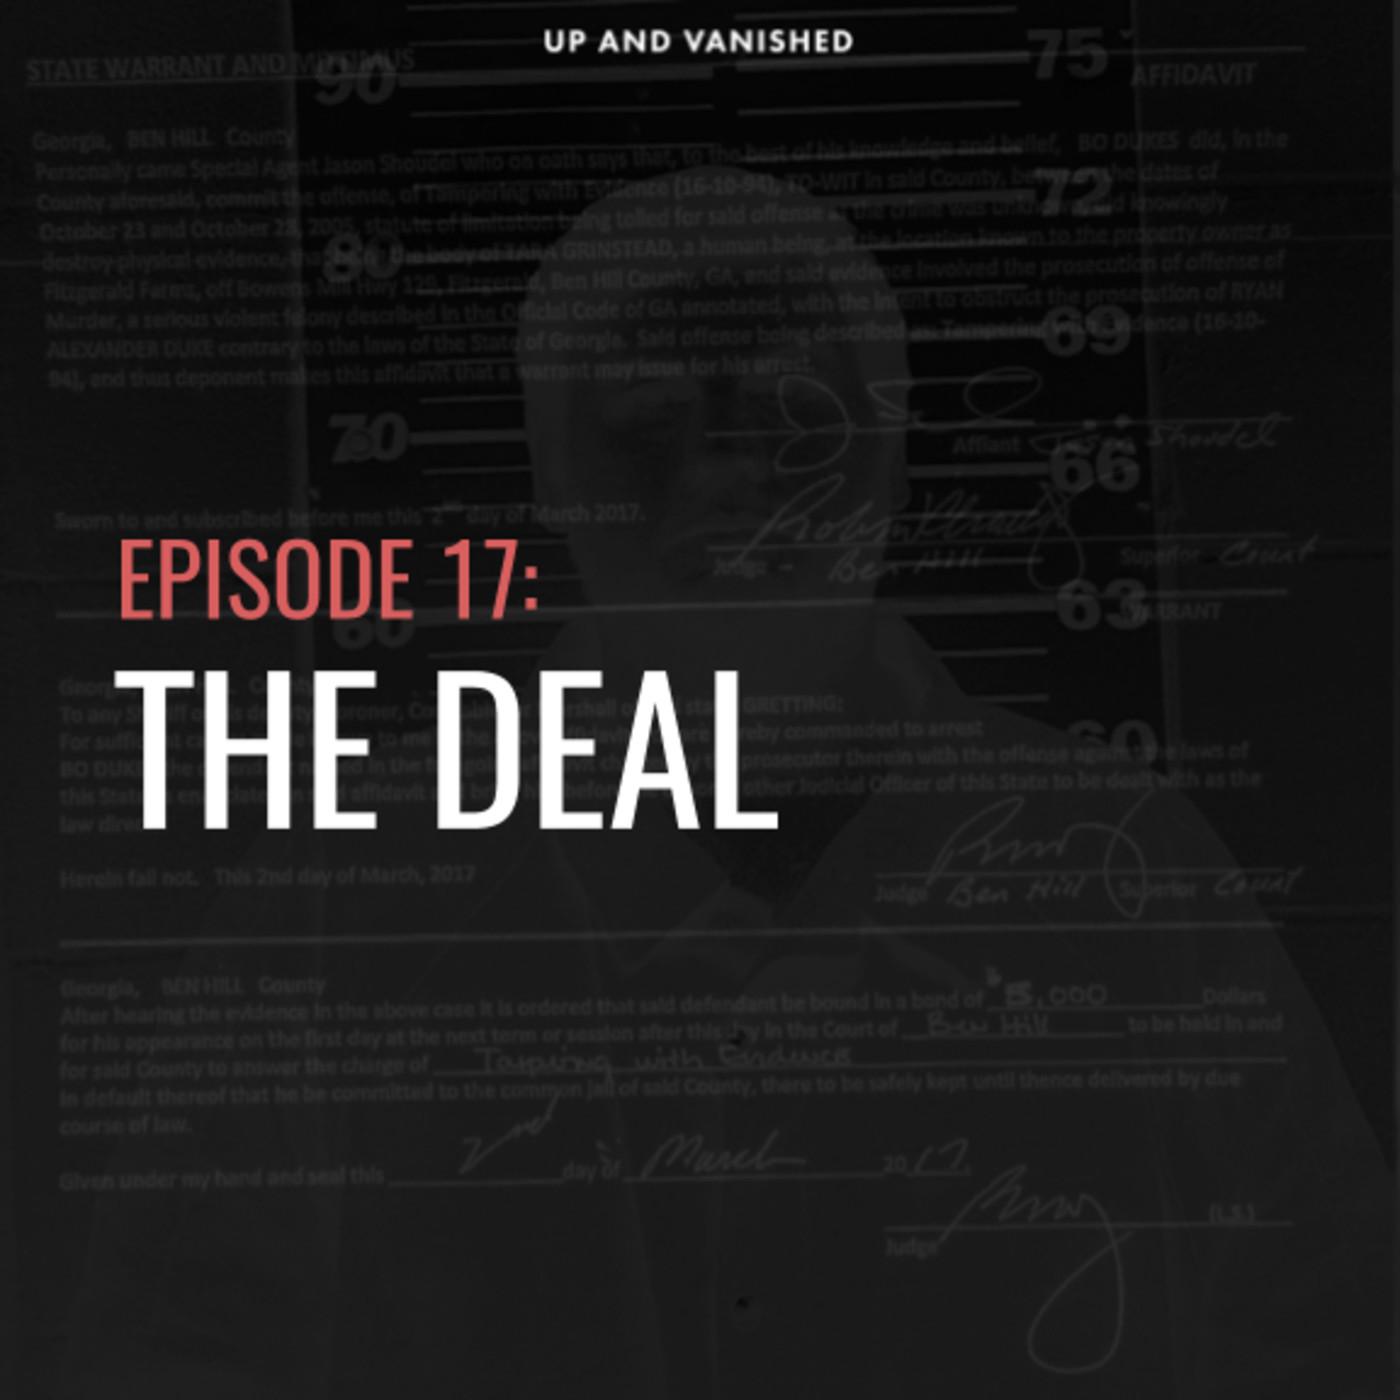 S1E17: The Deal